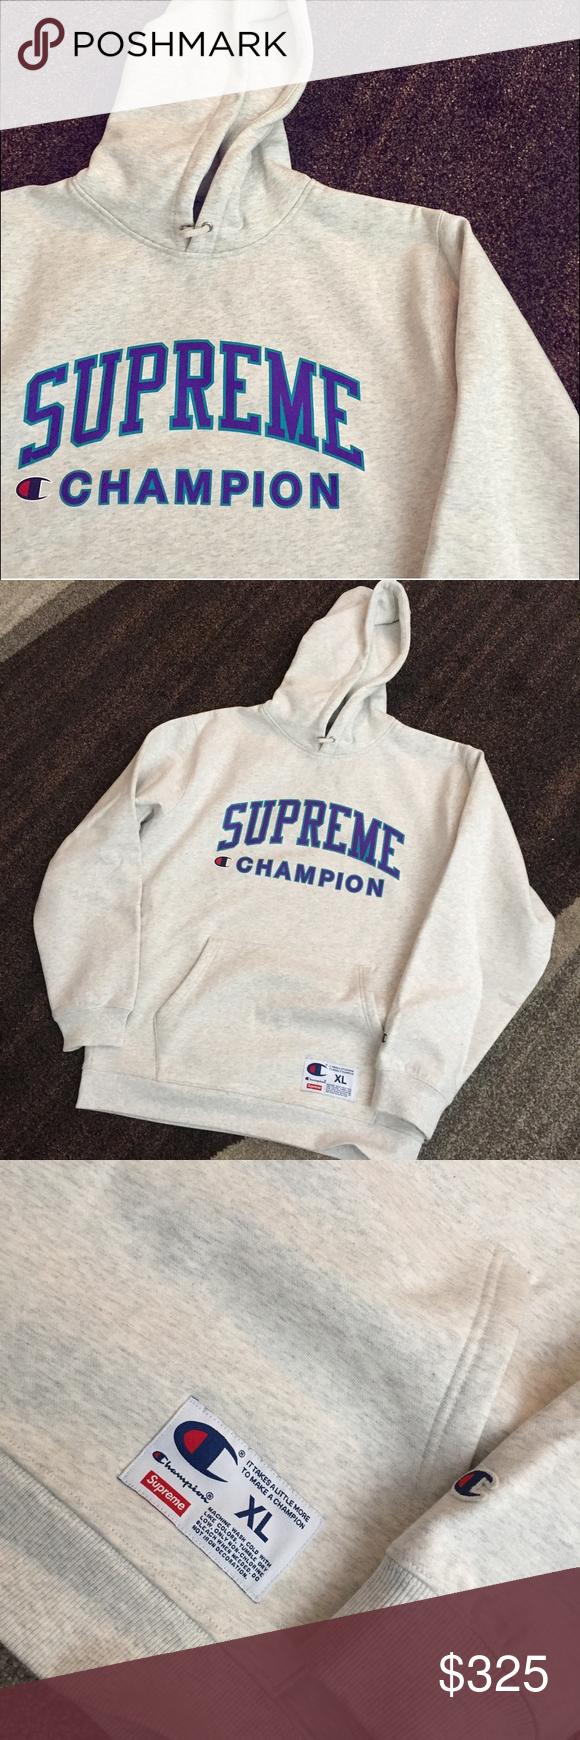 Supreme X Champion Hooded Sweatshirt Ss17 Champion Hooded Sweatshirt Sweatshirts Hooded Sweatshirts [ 1740 x 580 Pixel ]